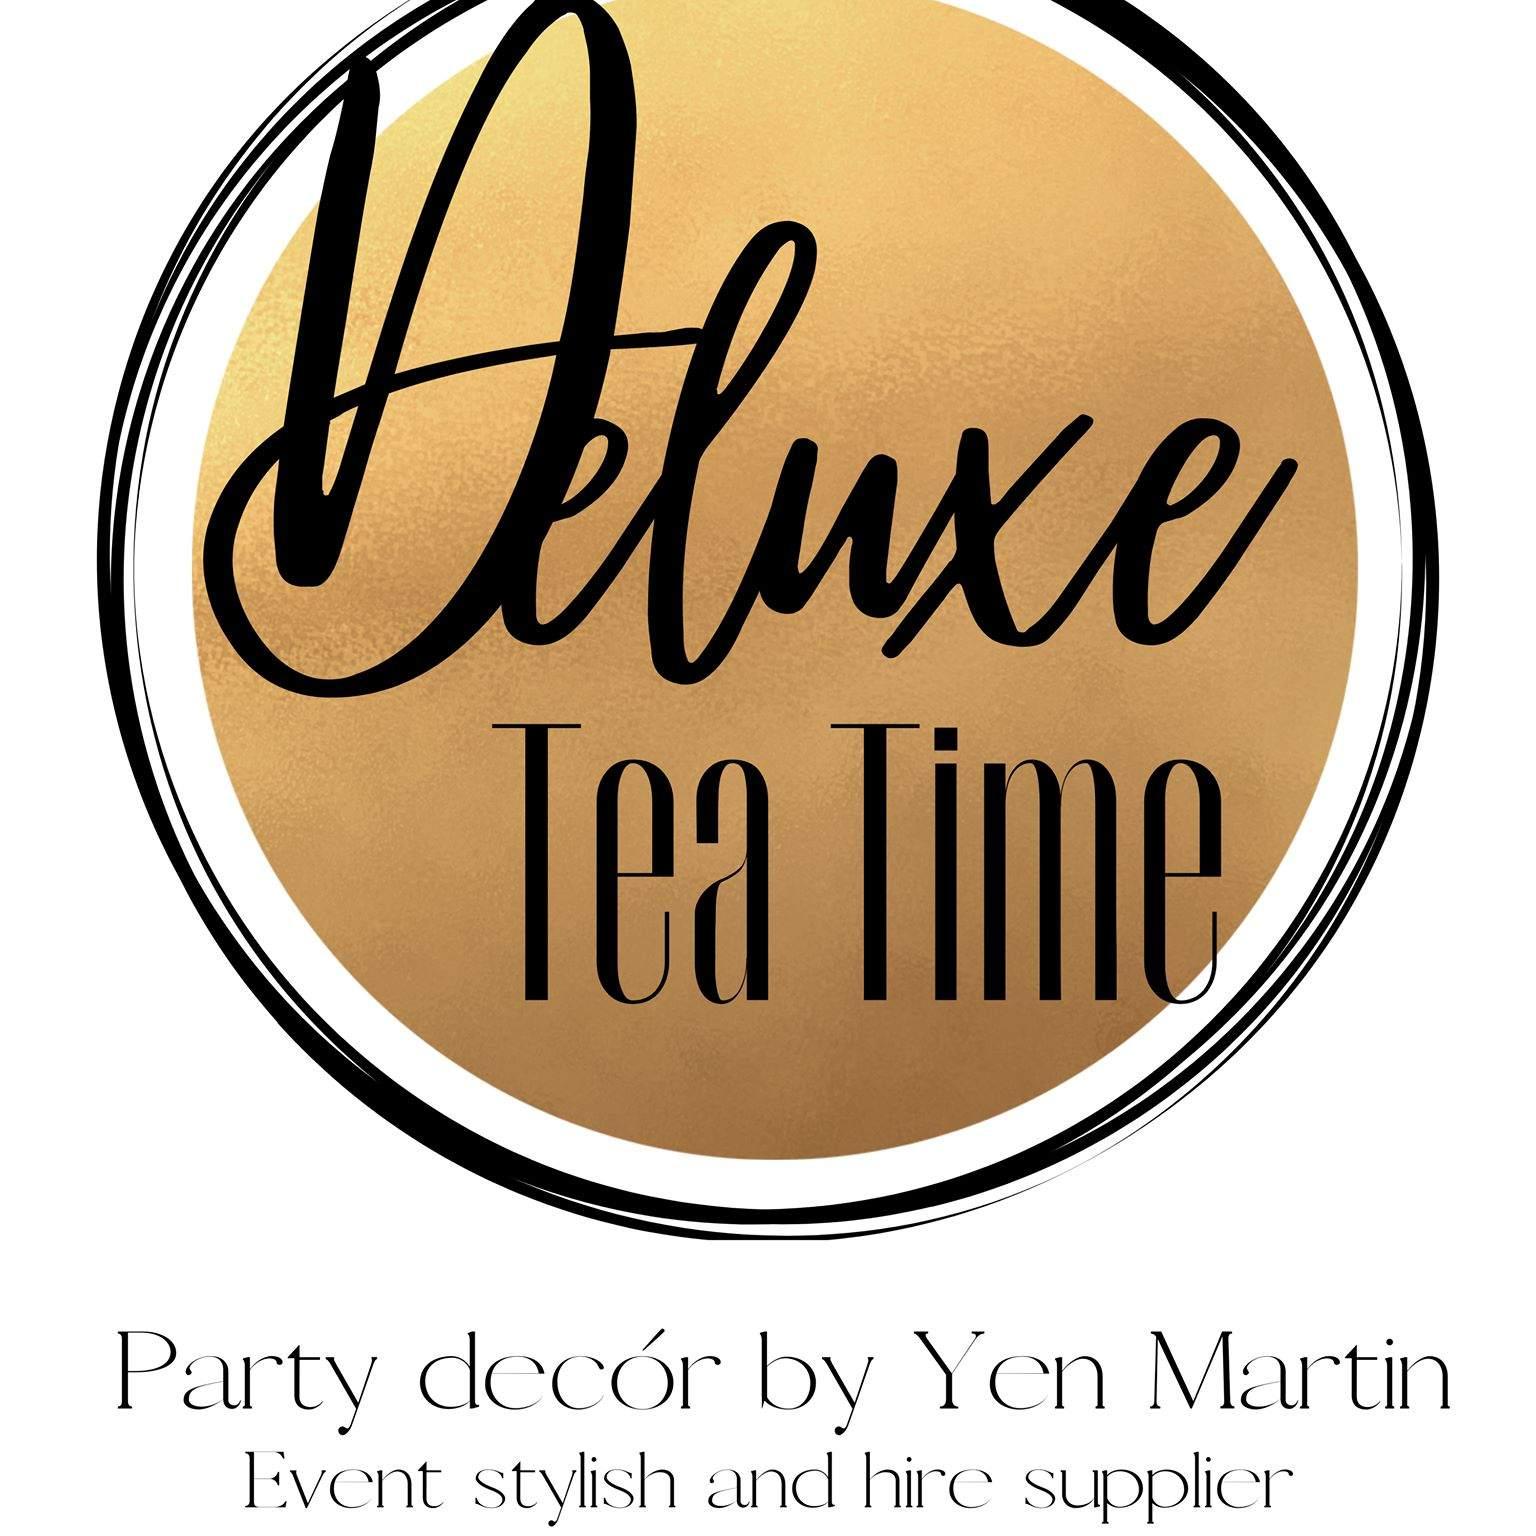 Deluxe Tea Time